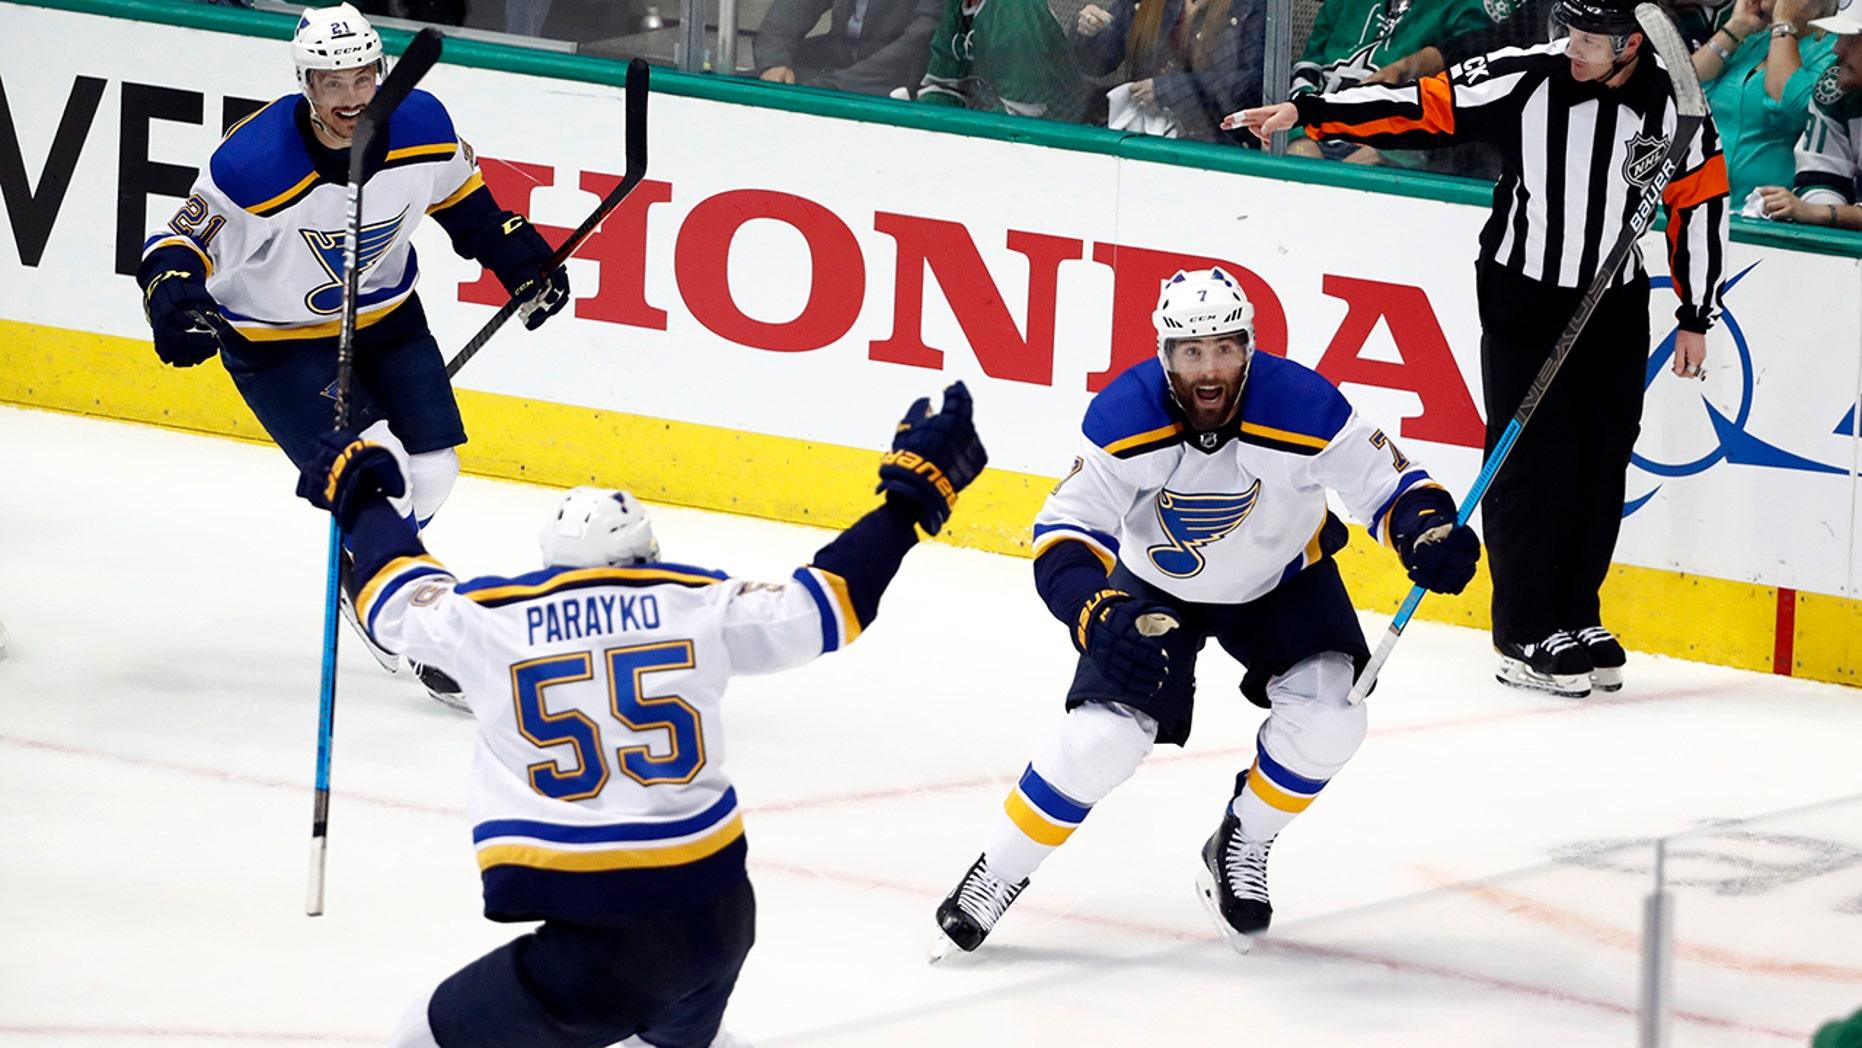 St. Louis Blues的Tyler Bozak(21岁),Colton Parayko(55岁)和Pat Maroon(7岁)在达拉斯举行的NHL第二轮曲棍球季后赛第三场比赛的第三场比赛中庆祝Maroon对阵达拉斯之星的进球, 2019年4月29日,星期一。(美联社照片/ Tony Gutierrez)